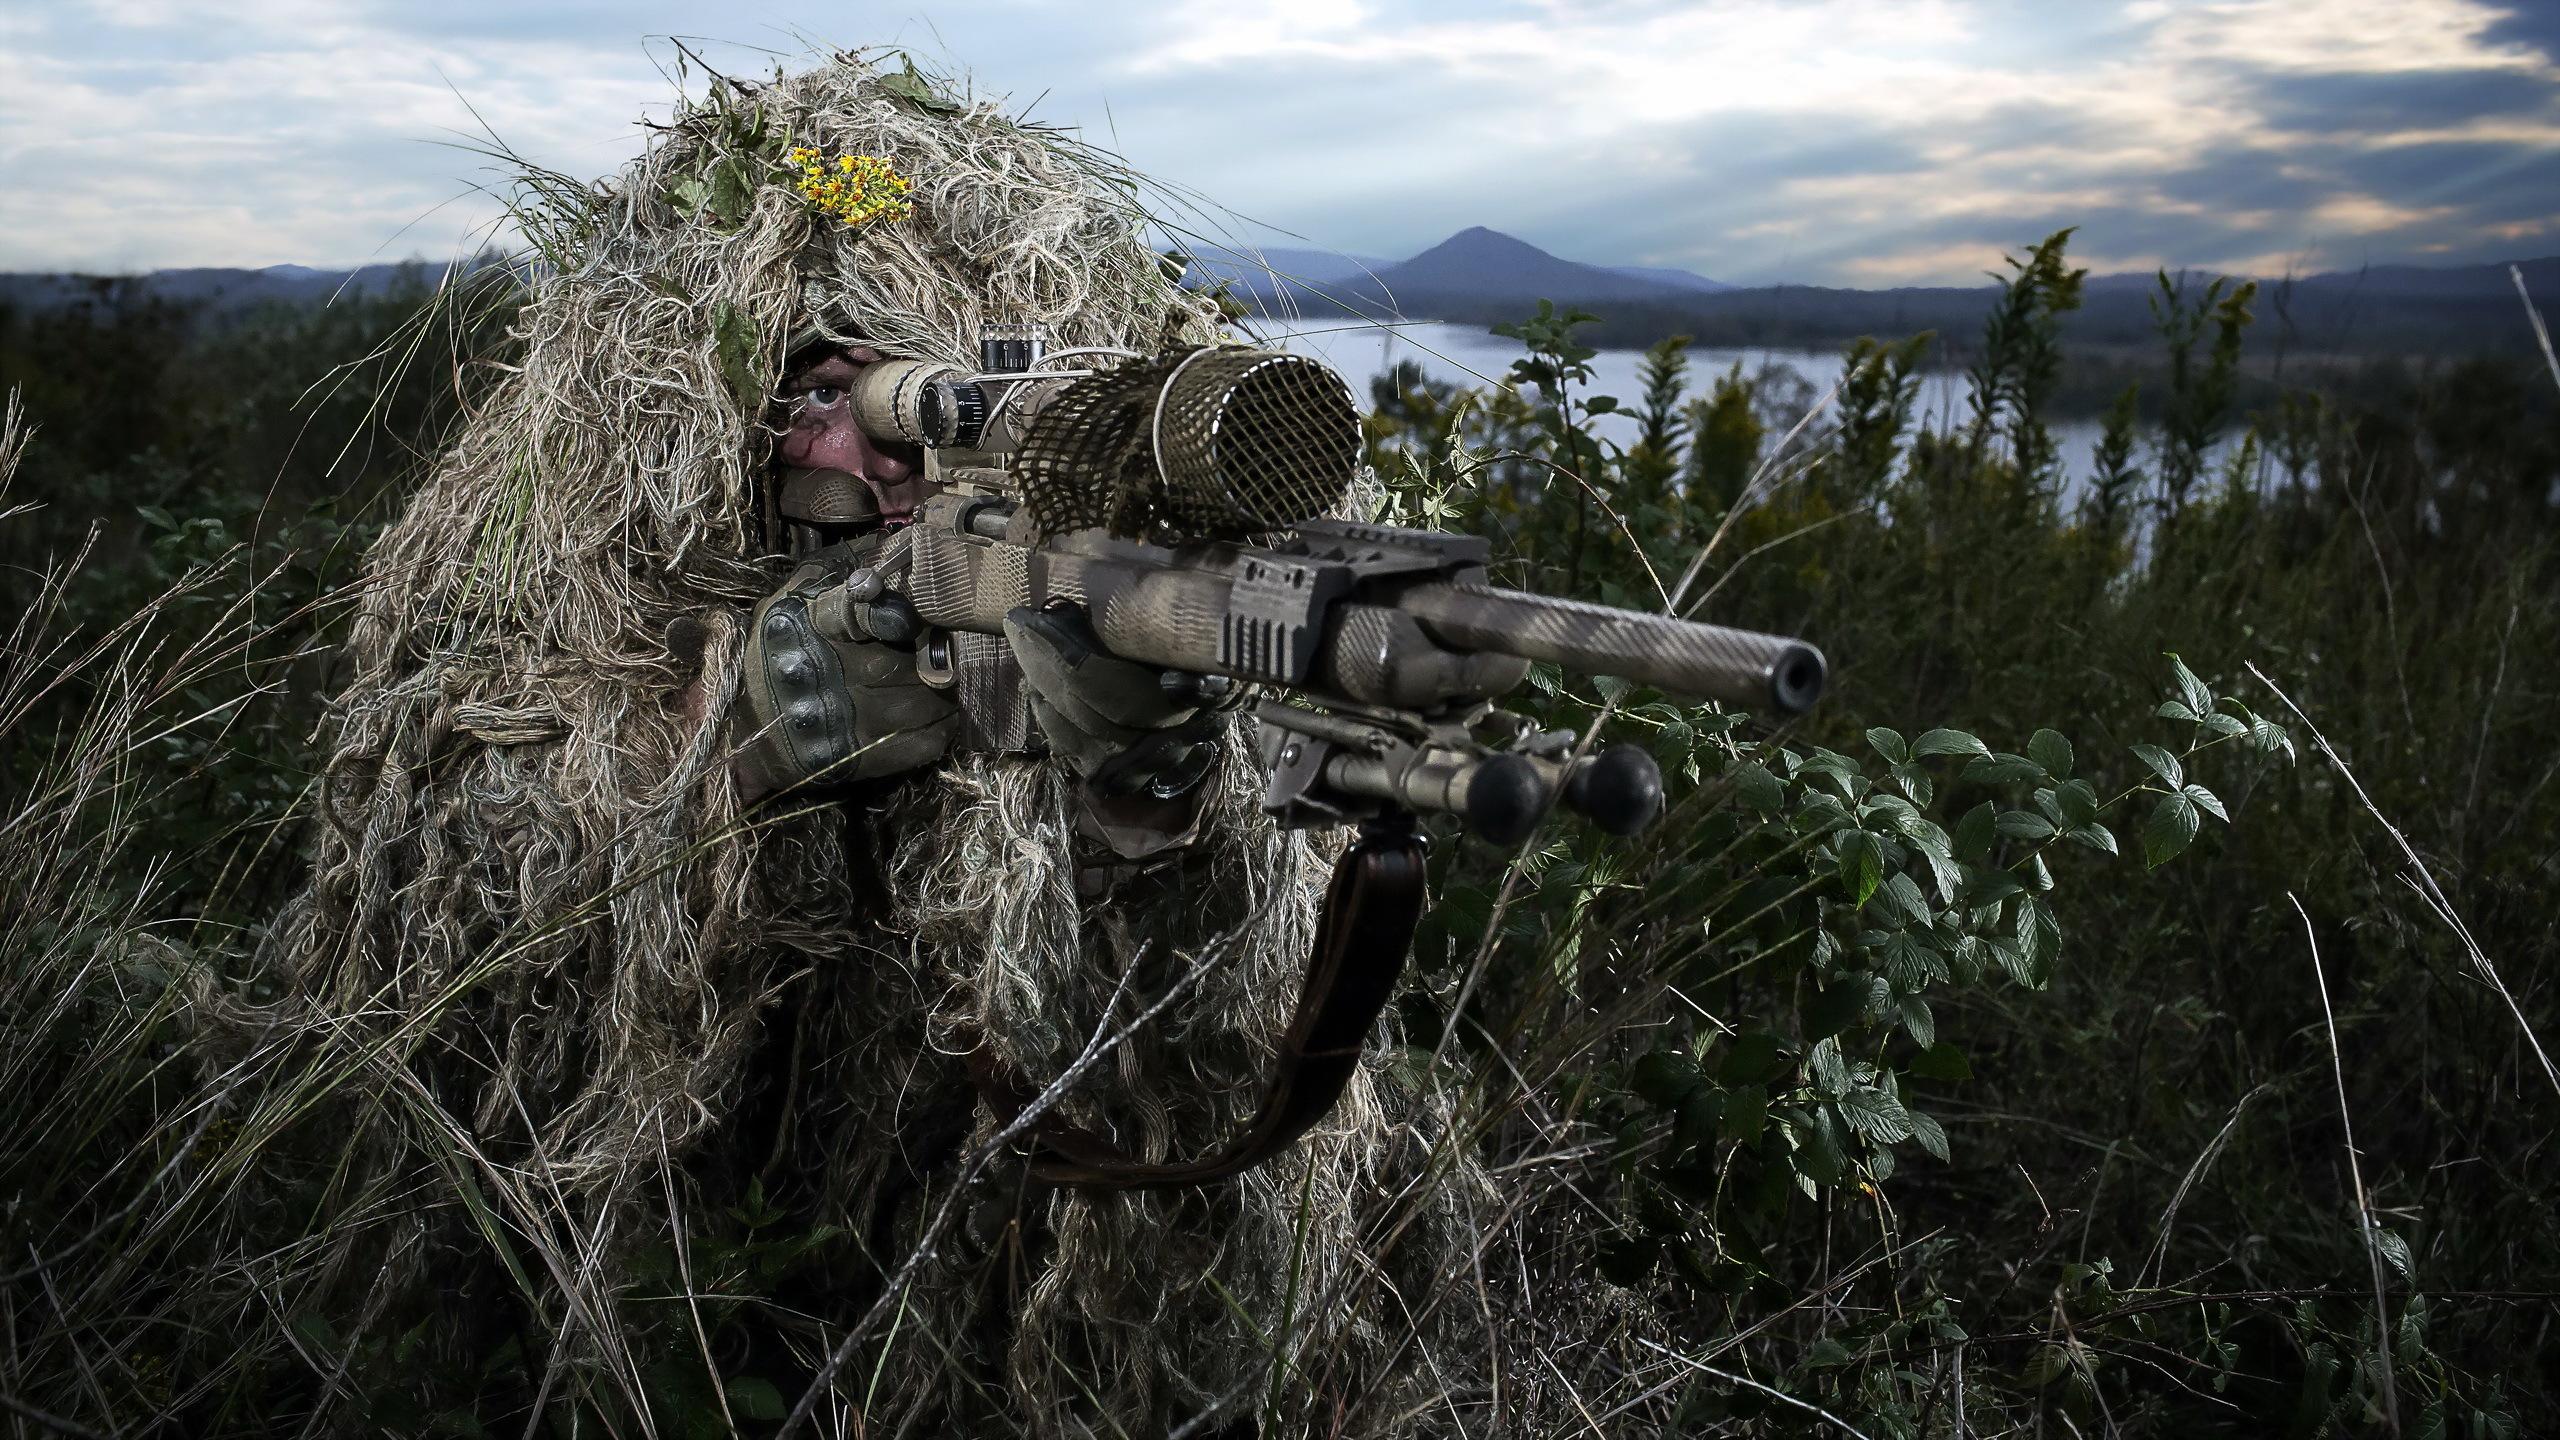 Sniper rifle soldier weapon gun military d wallpaper 2560x1440 2560x1440